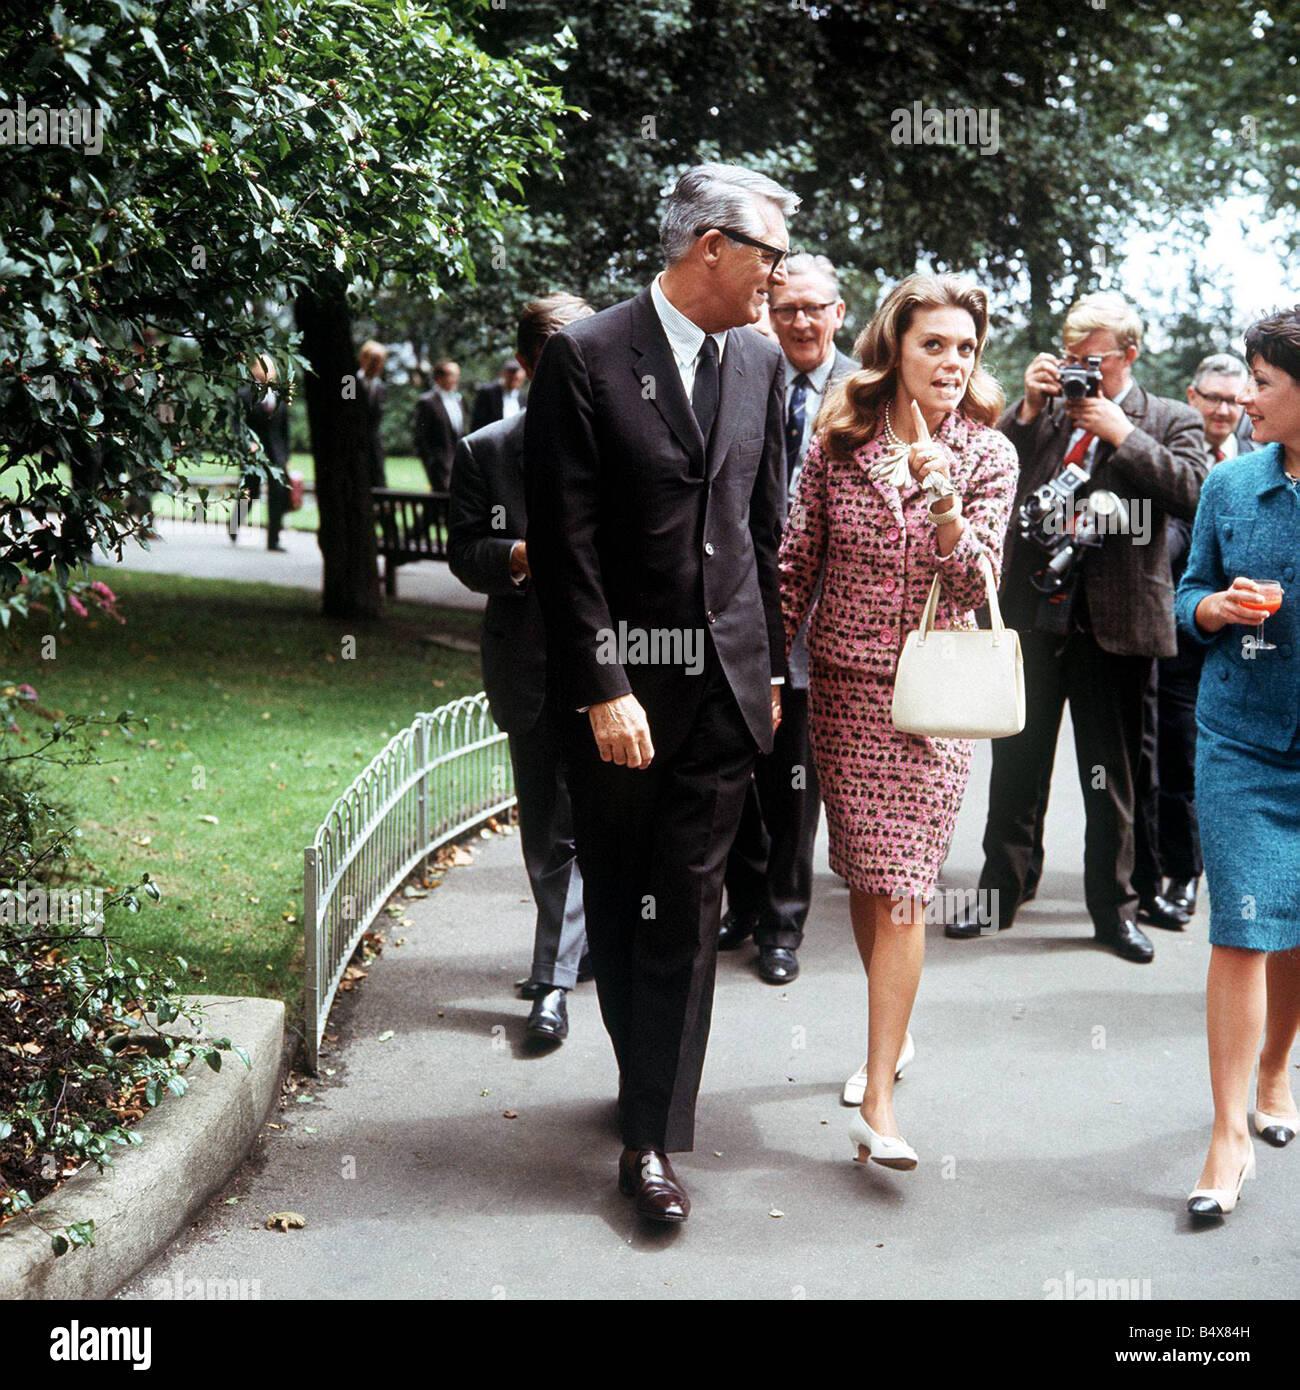 Cary Grant zu Fuß in Embankment Gardens mit Frau Dyan Stockbild